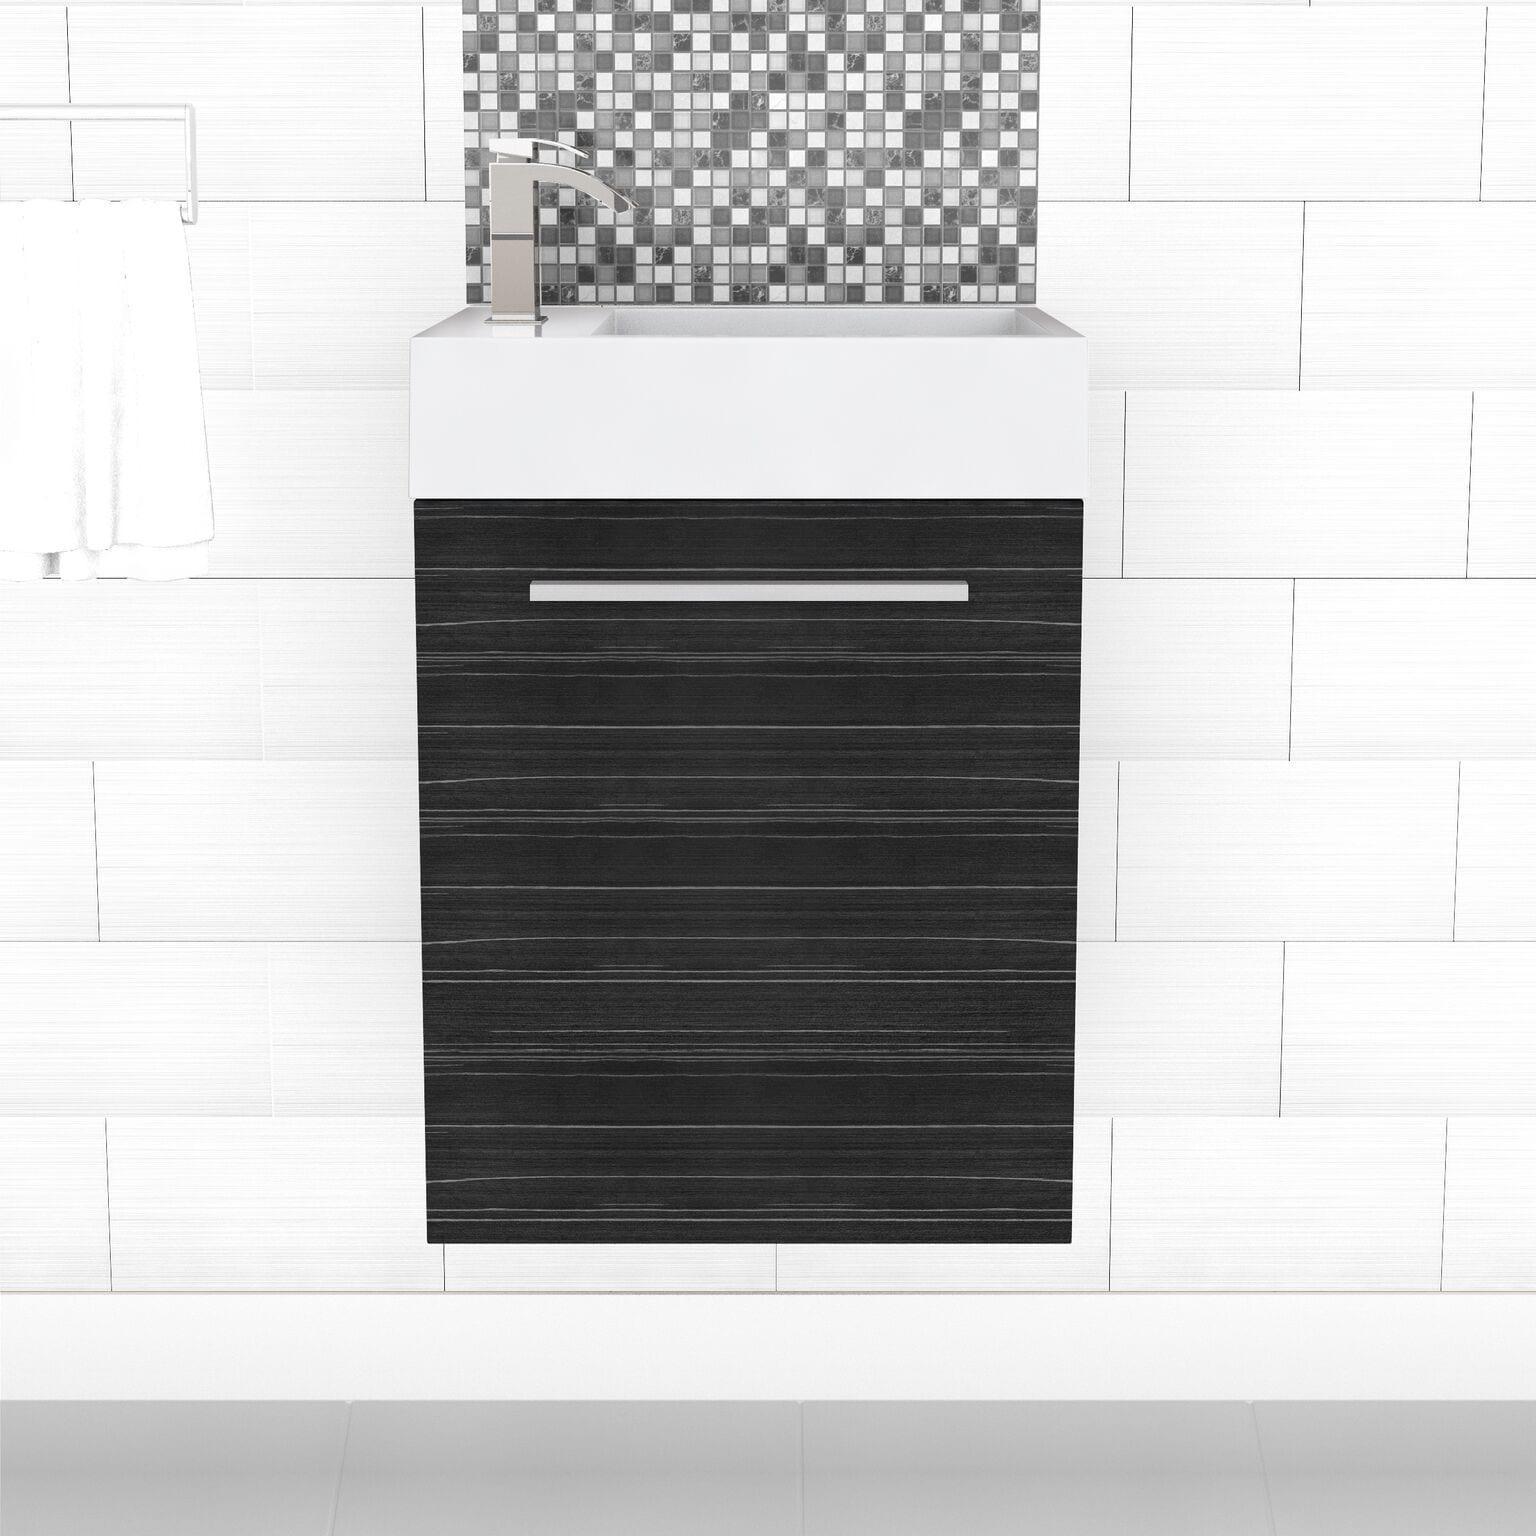 wayfair bath bowl reviews beaufiful vanity kitchen gallery urban double cutler glamorous images